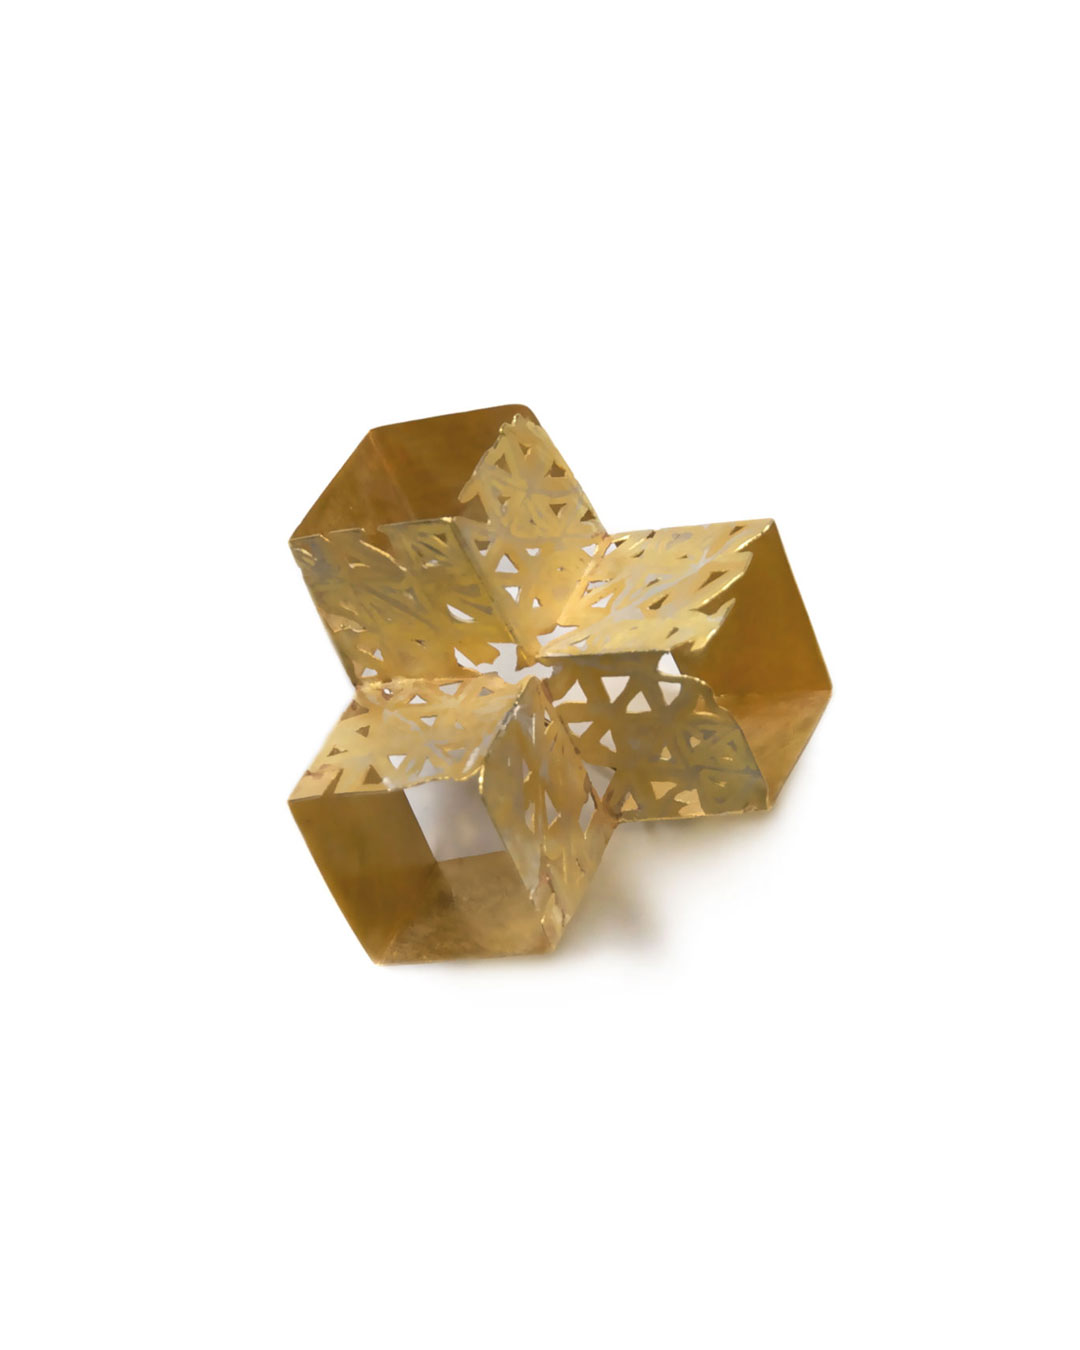 Stefano Marchetti, untitled, 2010, brooch; gold, 60 x 55 x 32 mm, €7300